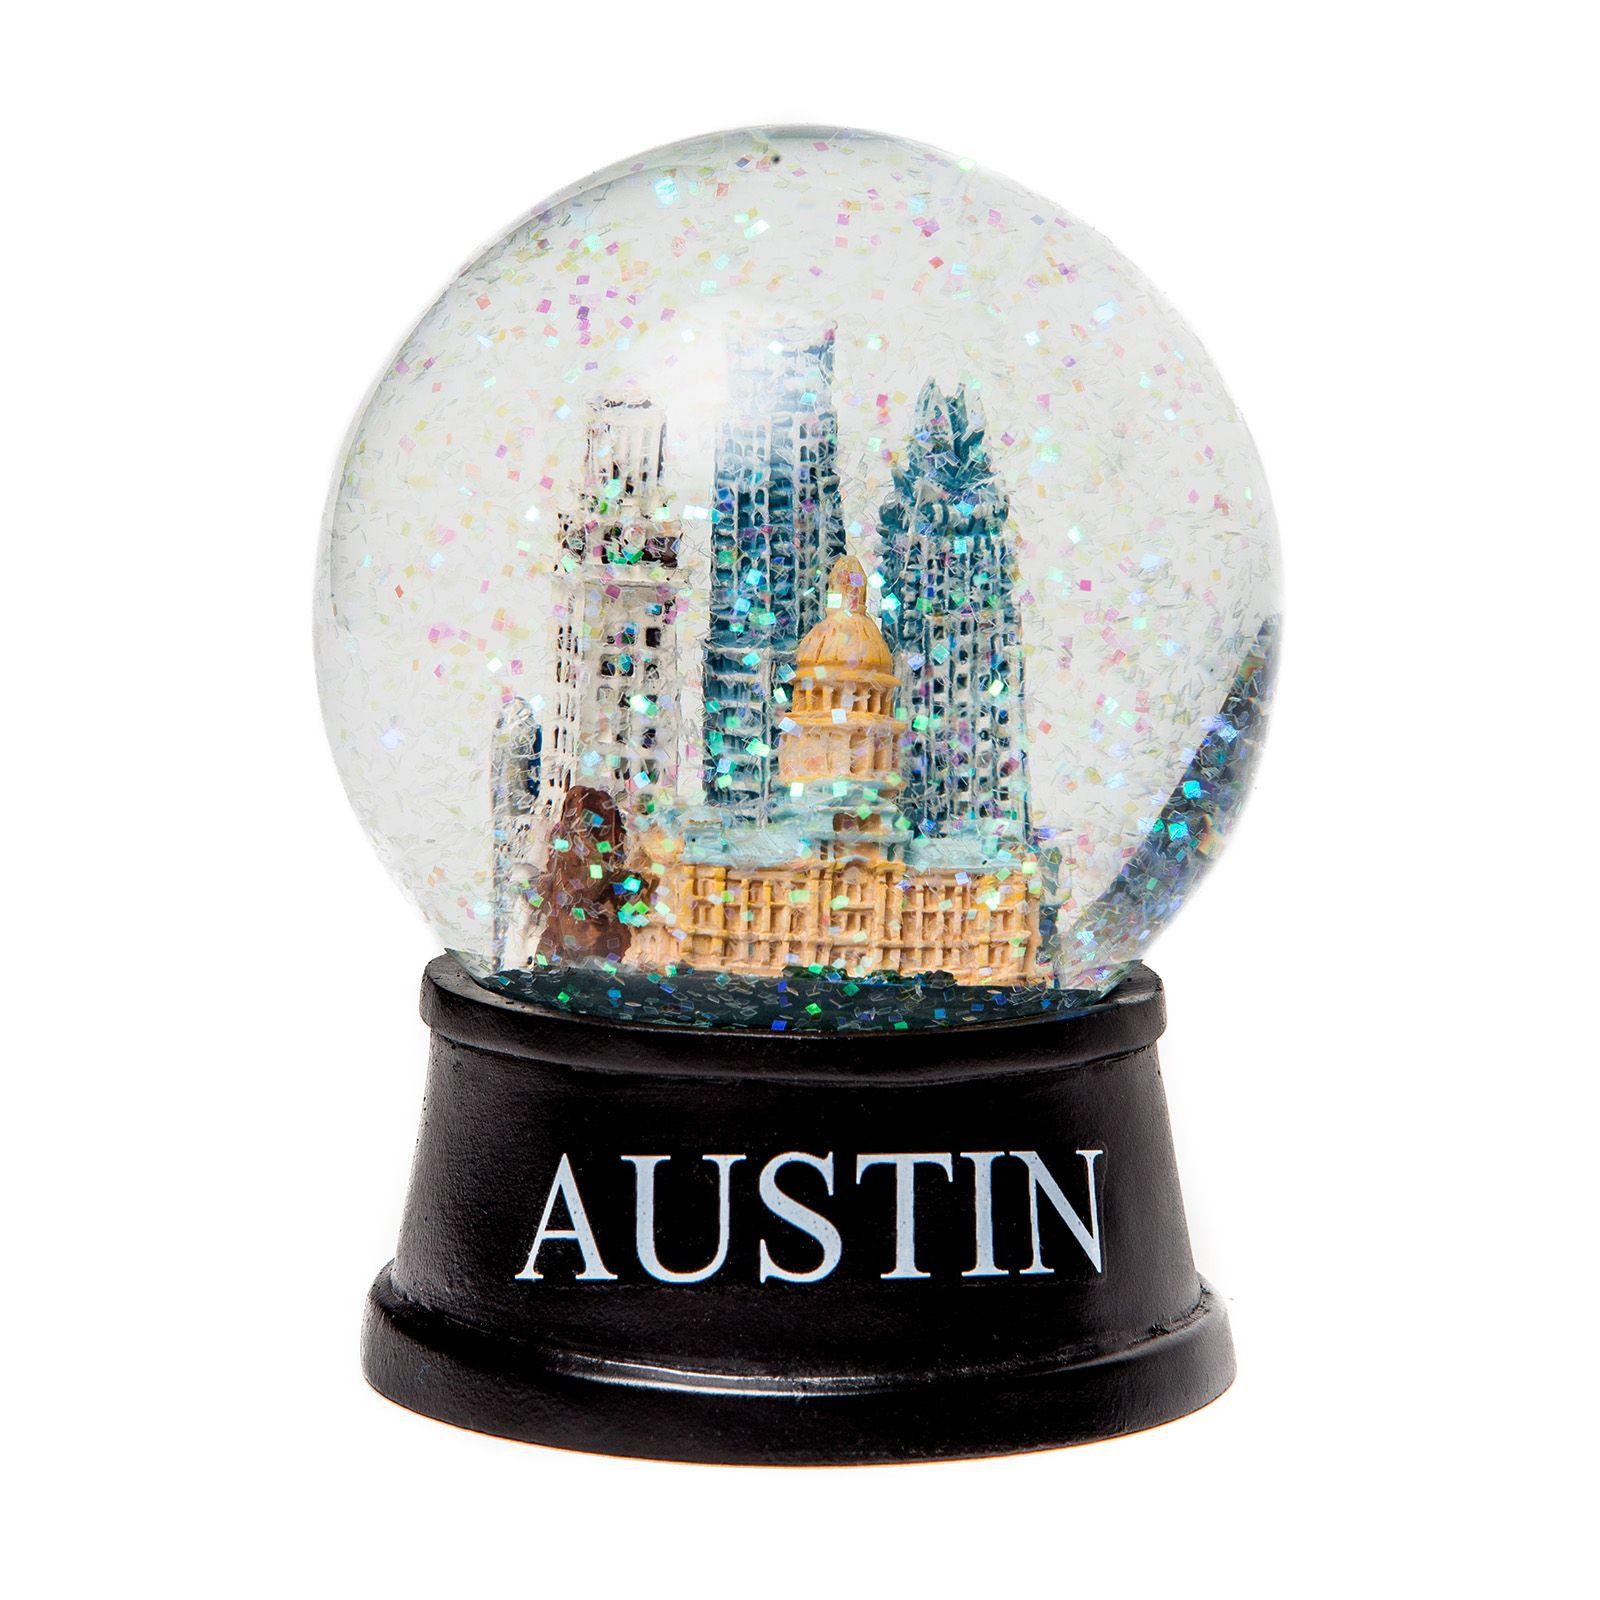 Austin Texas Small Glass Snow Globe Texas Capitol Gift Shop